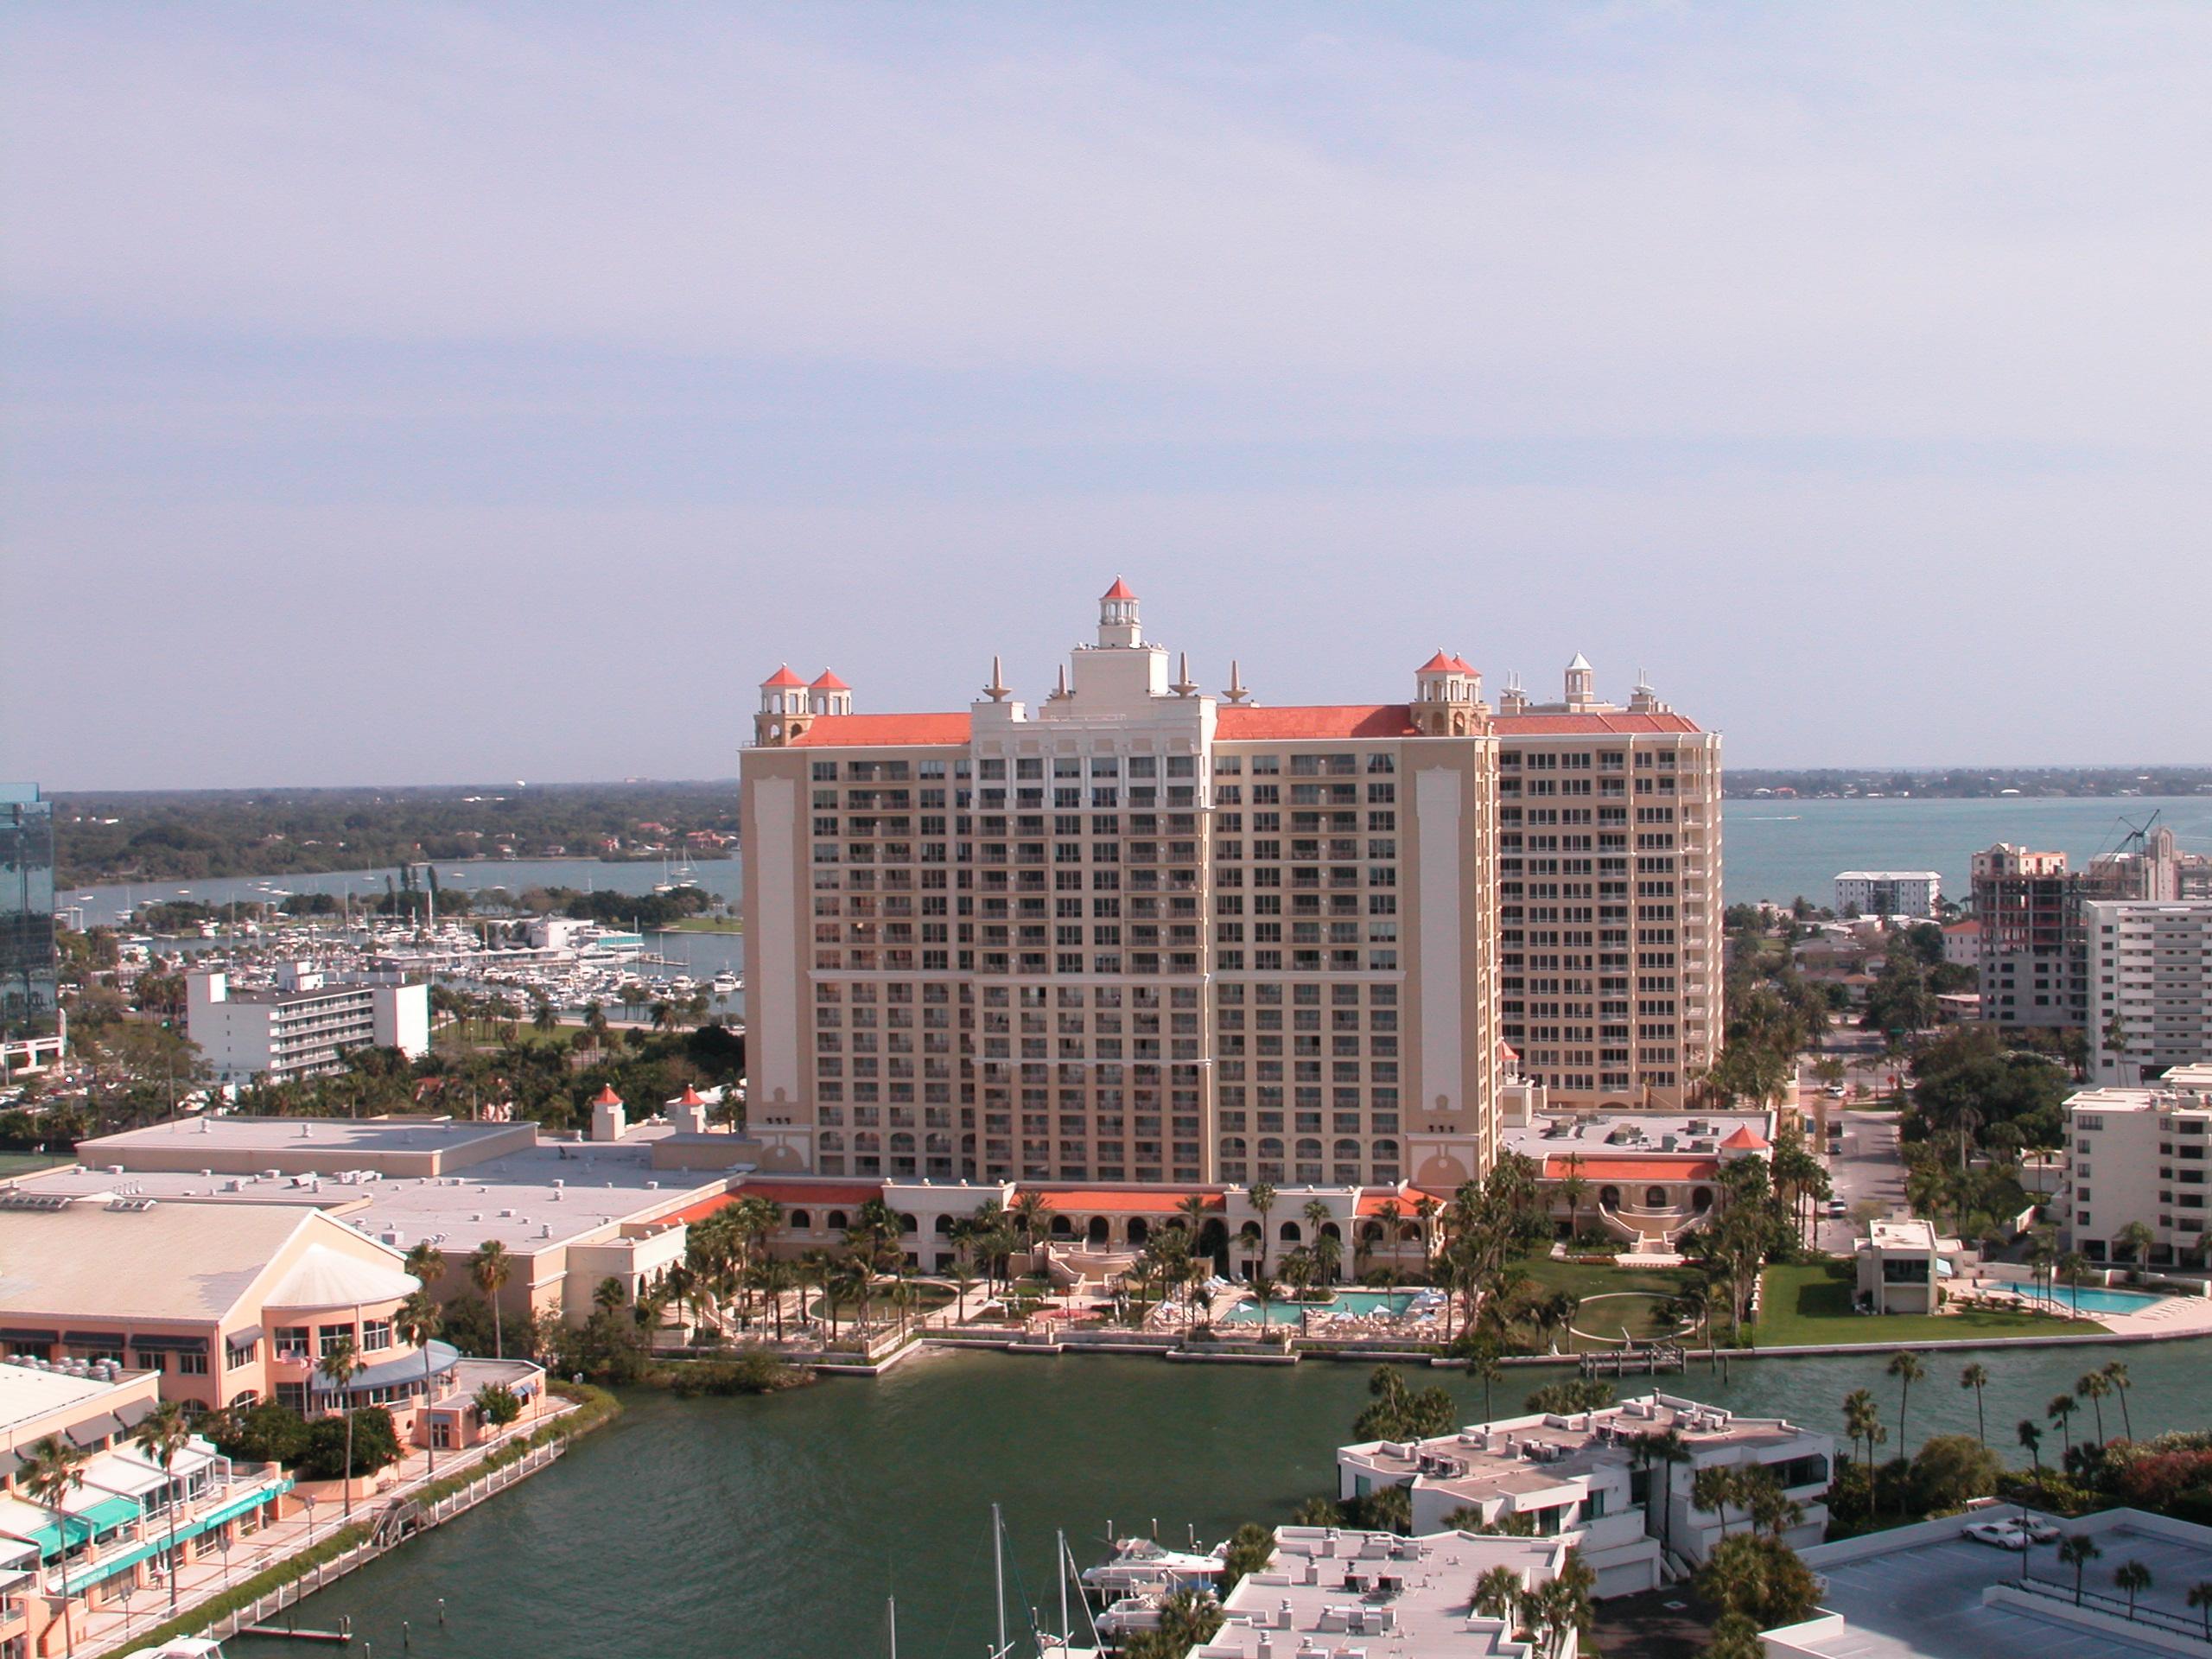 The Ritz Carlton, Sarasota High-end quarters with balconies & smart TVs, plus an 18-hole golf course & a free beach shuttle. 1111 Ritz Carlton Dr, Sarasota, FL 34236 ritzcarlton.com (941) 309-2000